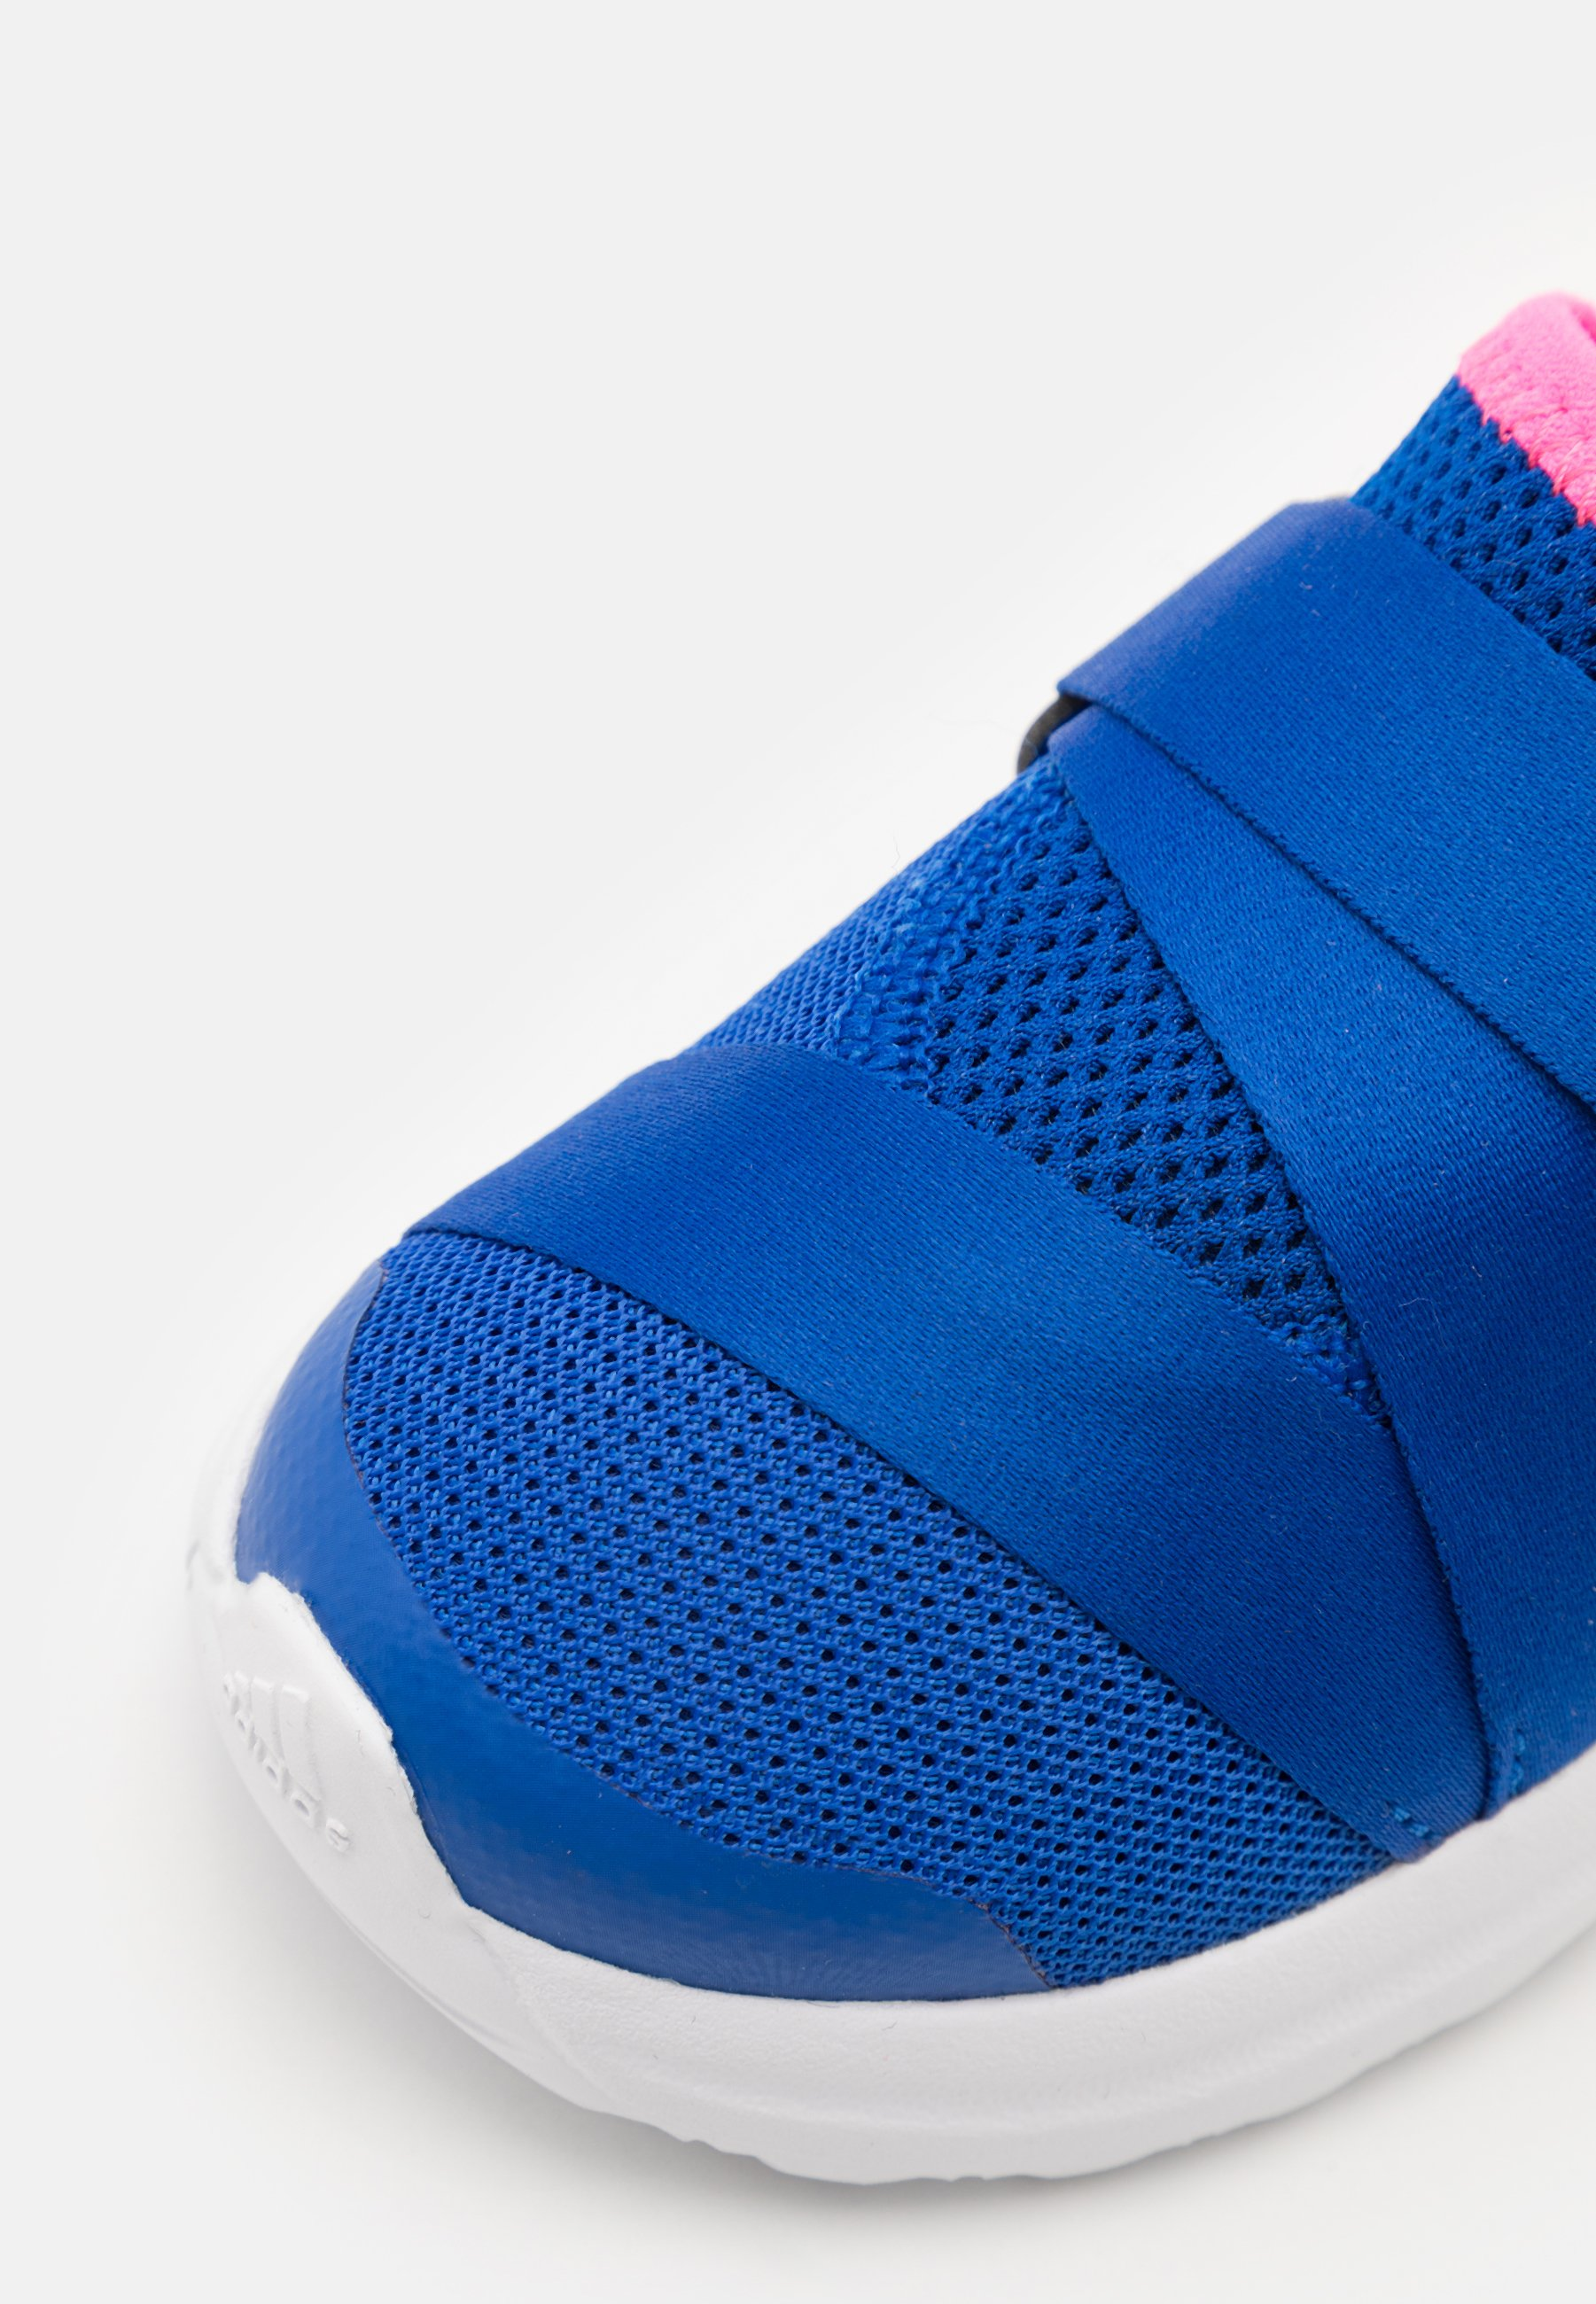 FORTARUN X UNISEX - Chaussures de running neutres - team royal blue/solar pink/footwear white